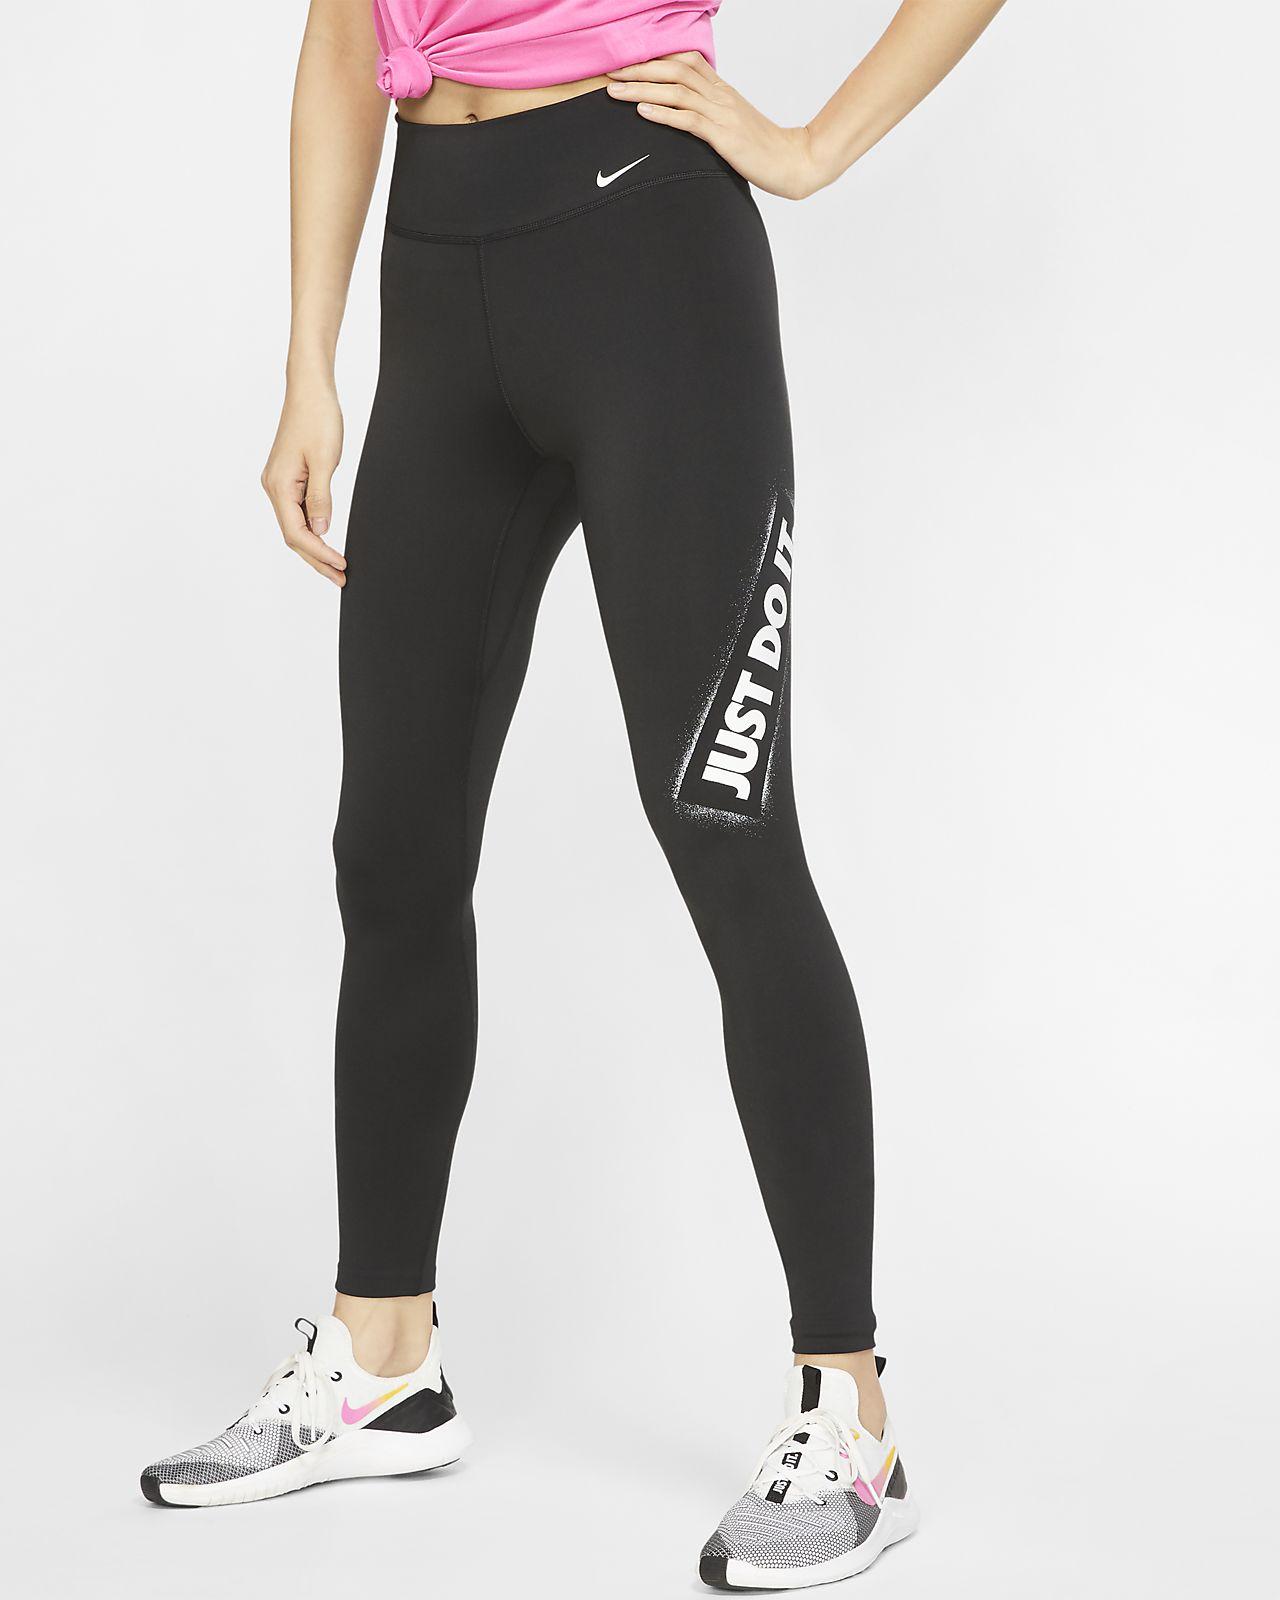 Tights JDI Nike One - Donna